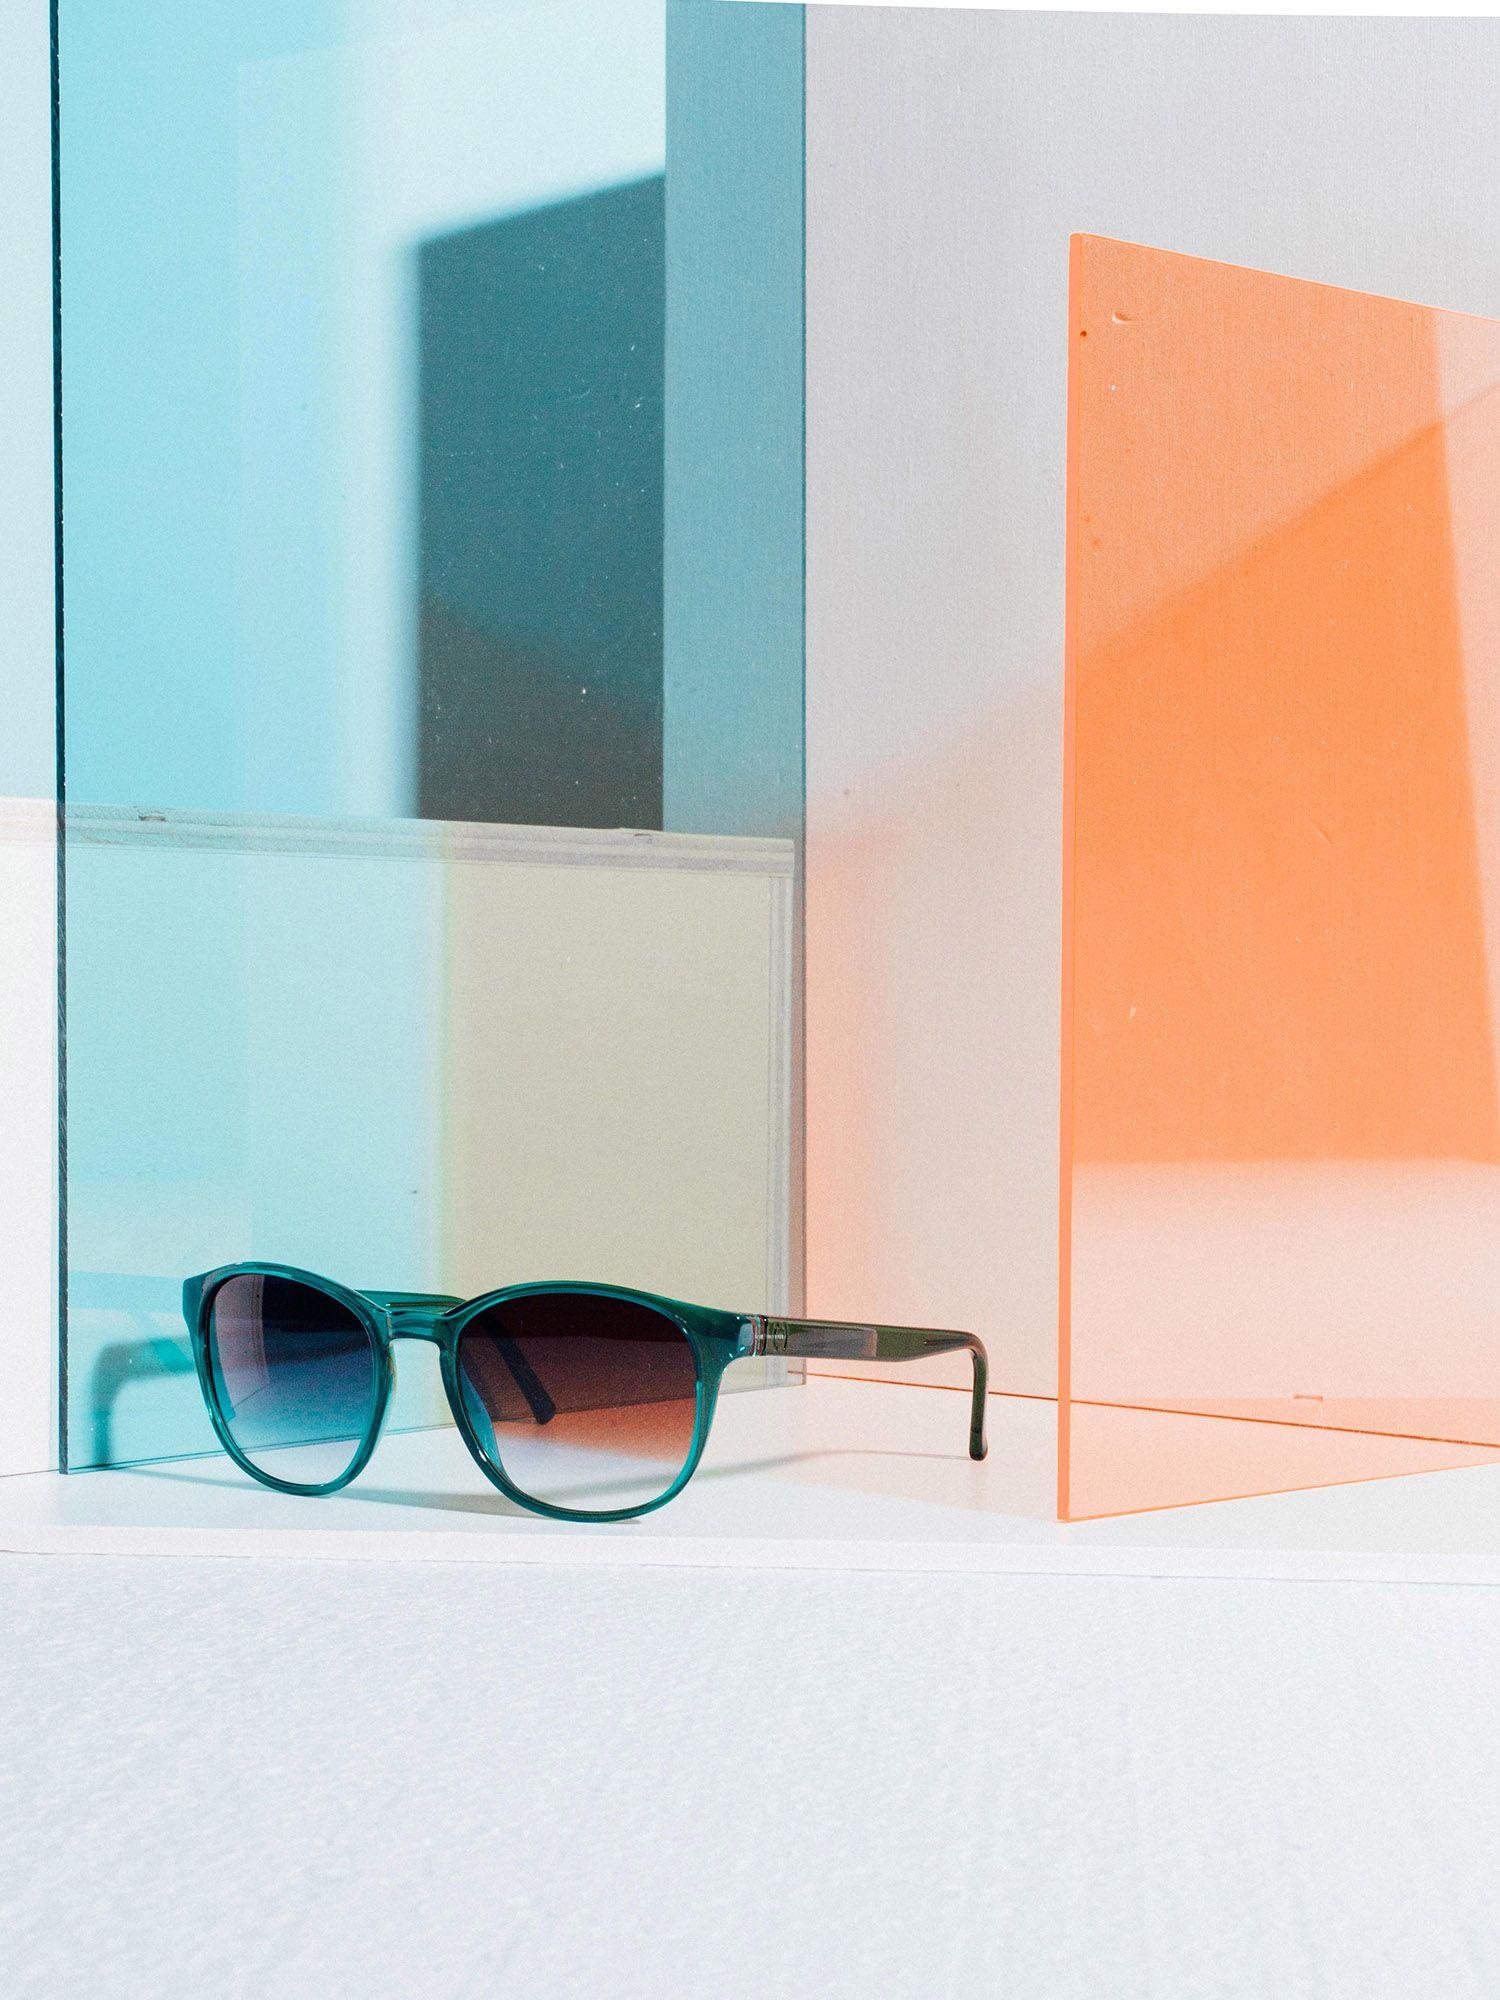 e88e39b316c  neubaueyewear  eyewear  terezamundilova  photography  stilllife  colors   sunglasses  sunnies  shades